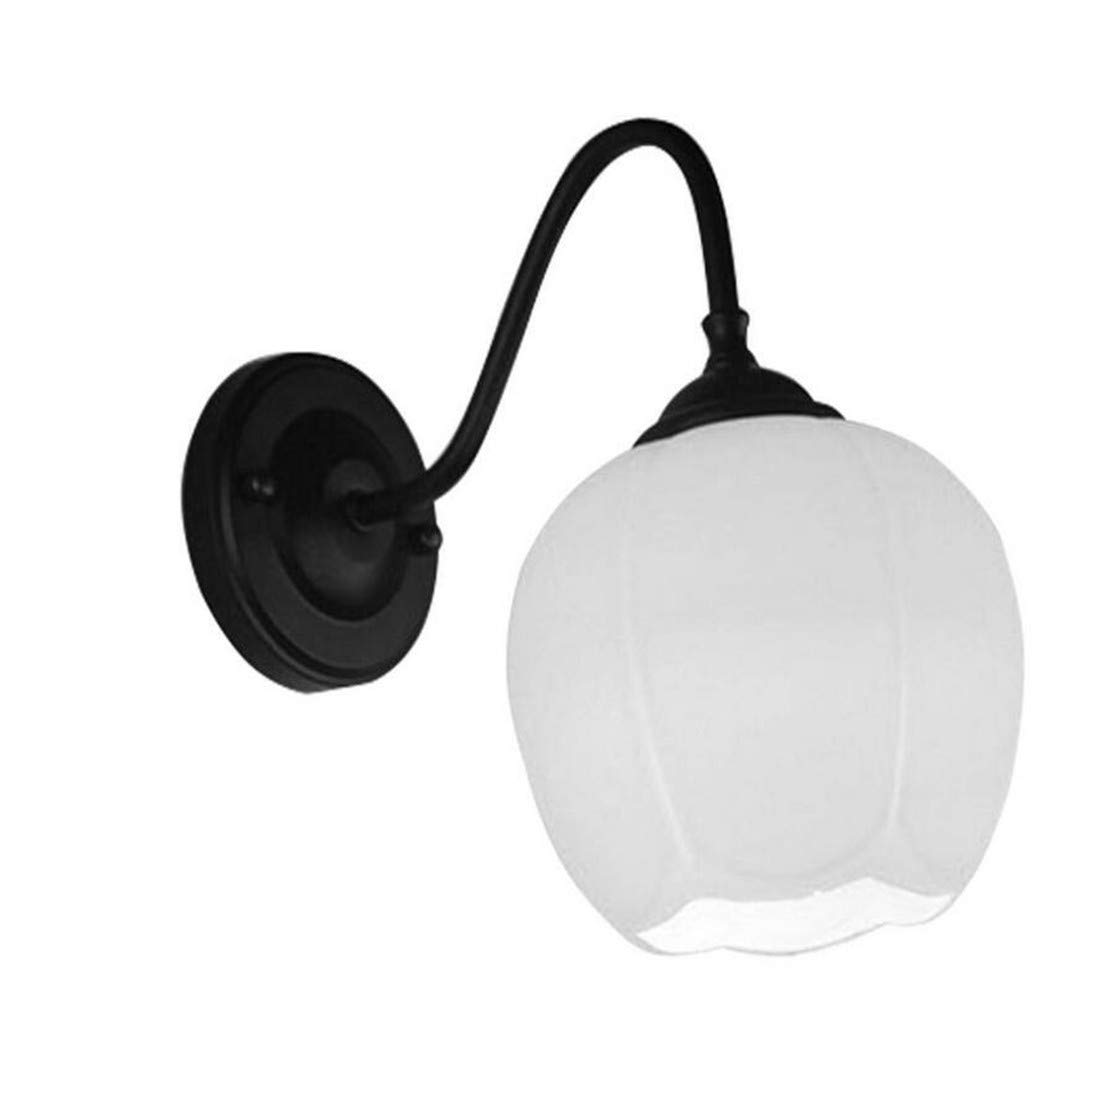 Led -leuchten Edison Lichter Weiß Glasabdeckung Energiesparende Einfache Moderne Led-lampe 110 V-240 V Wandleuchte Moderne Wandleuchte Le